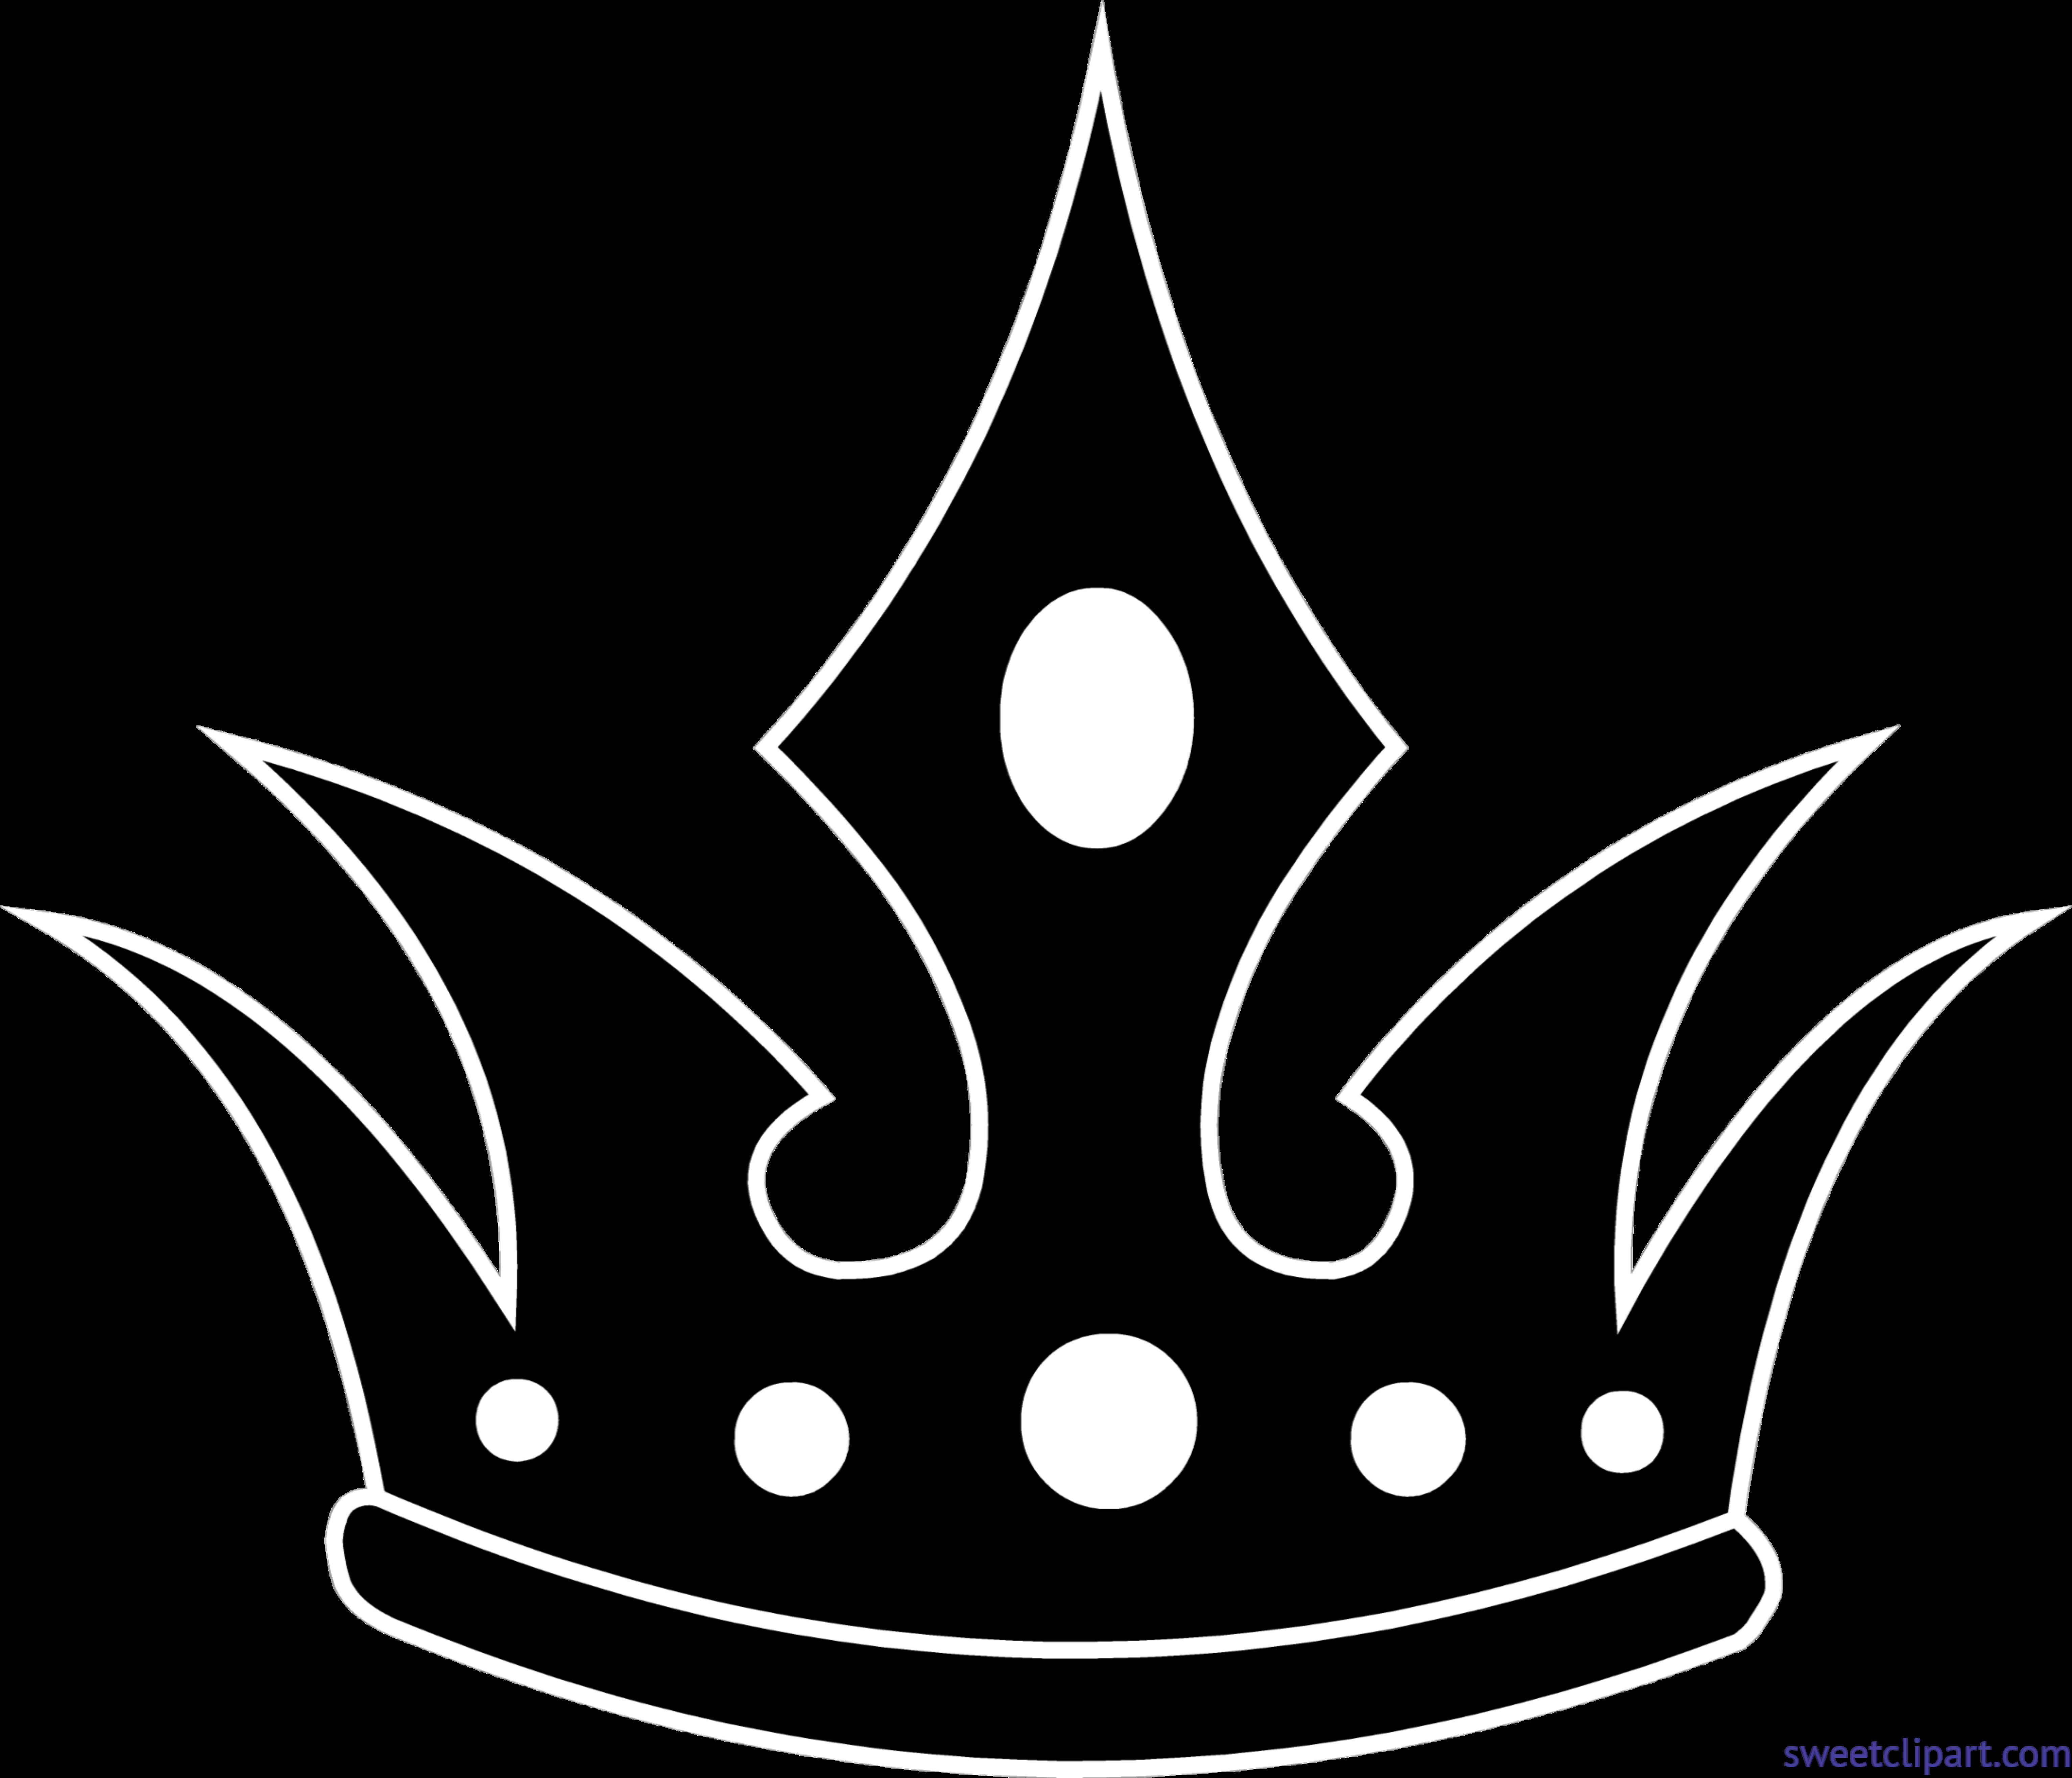 Clipart door fantasy. Crown silhouette clip art